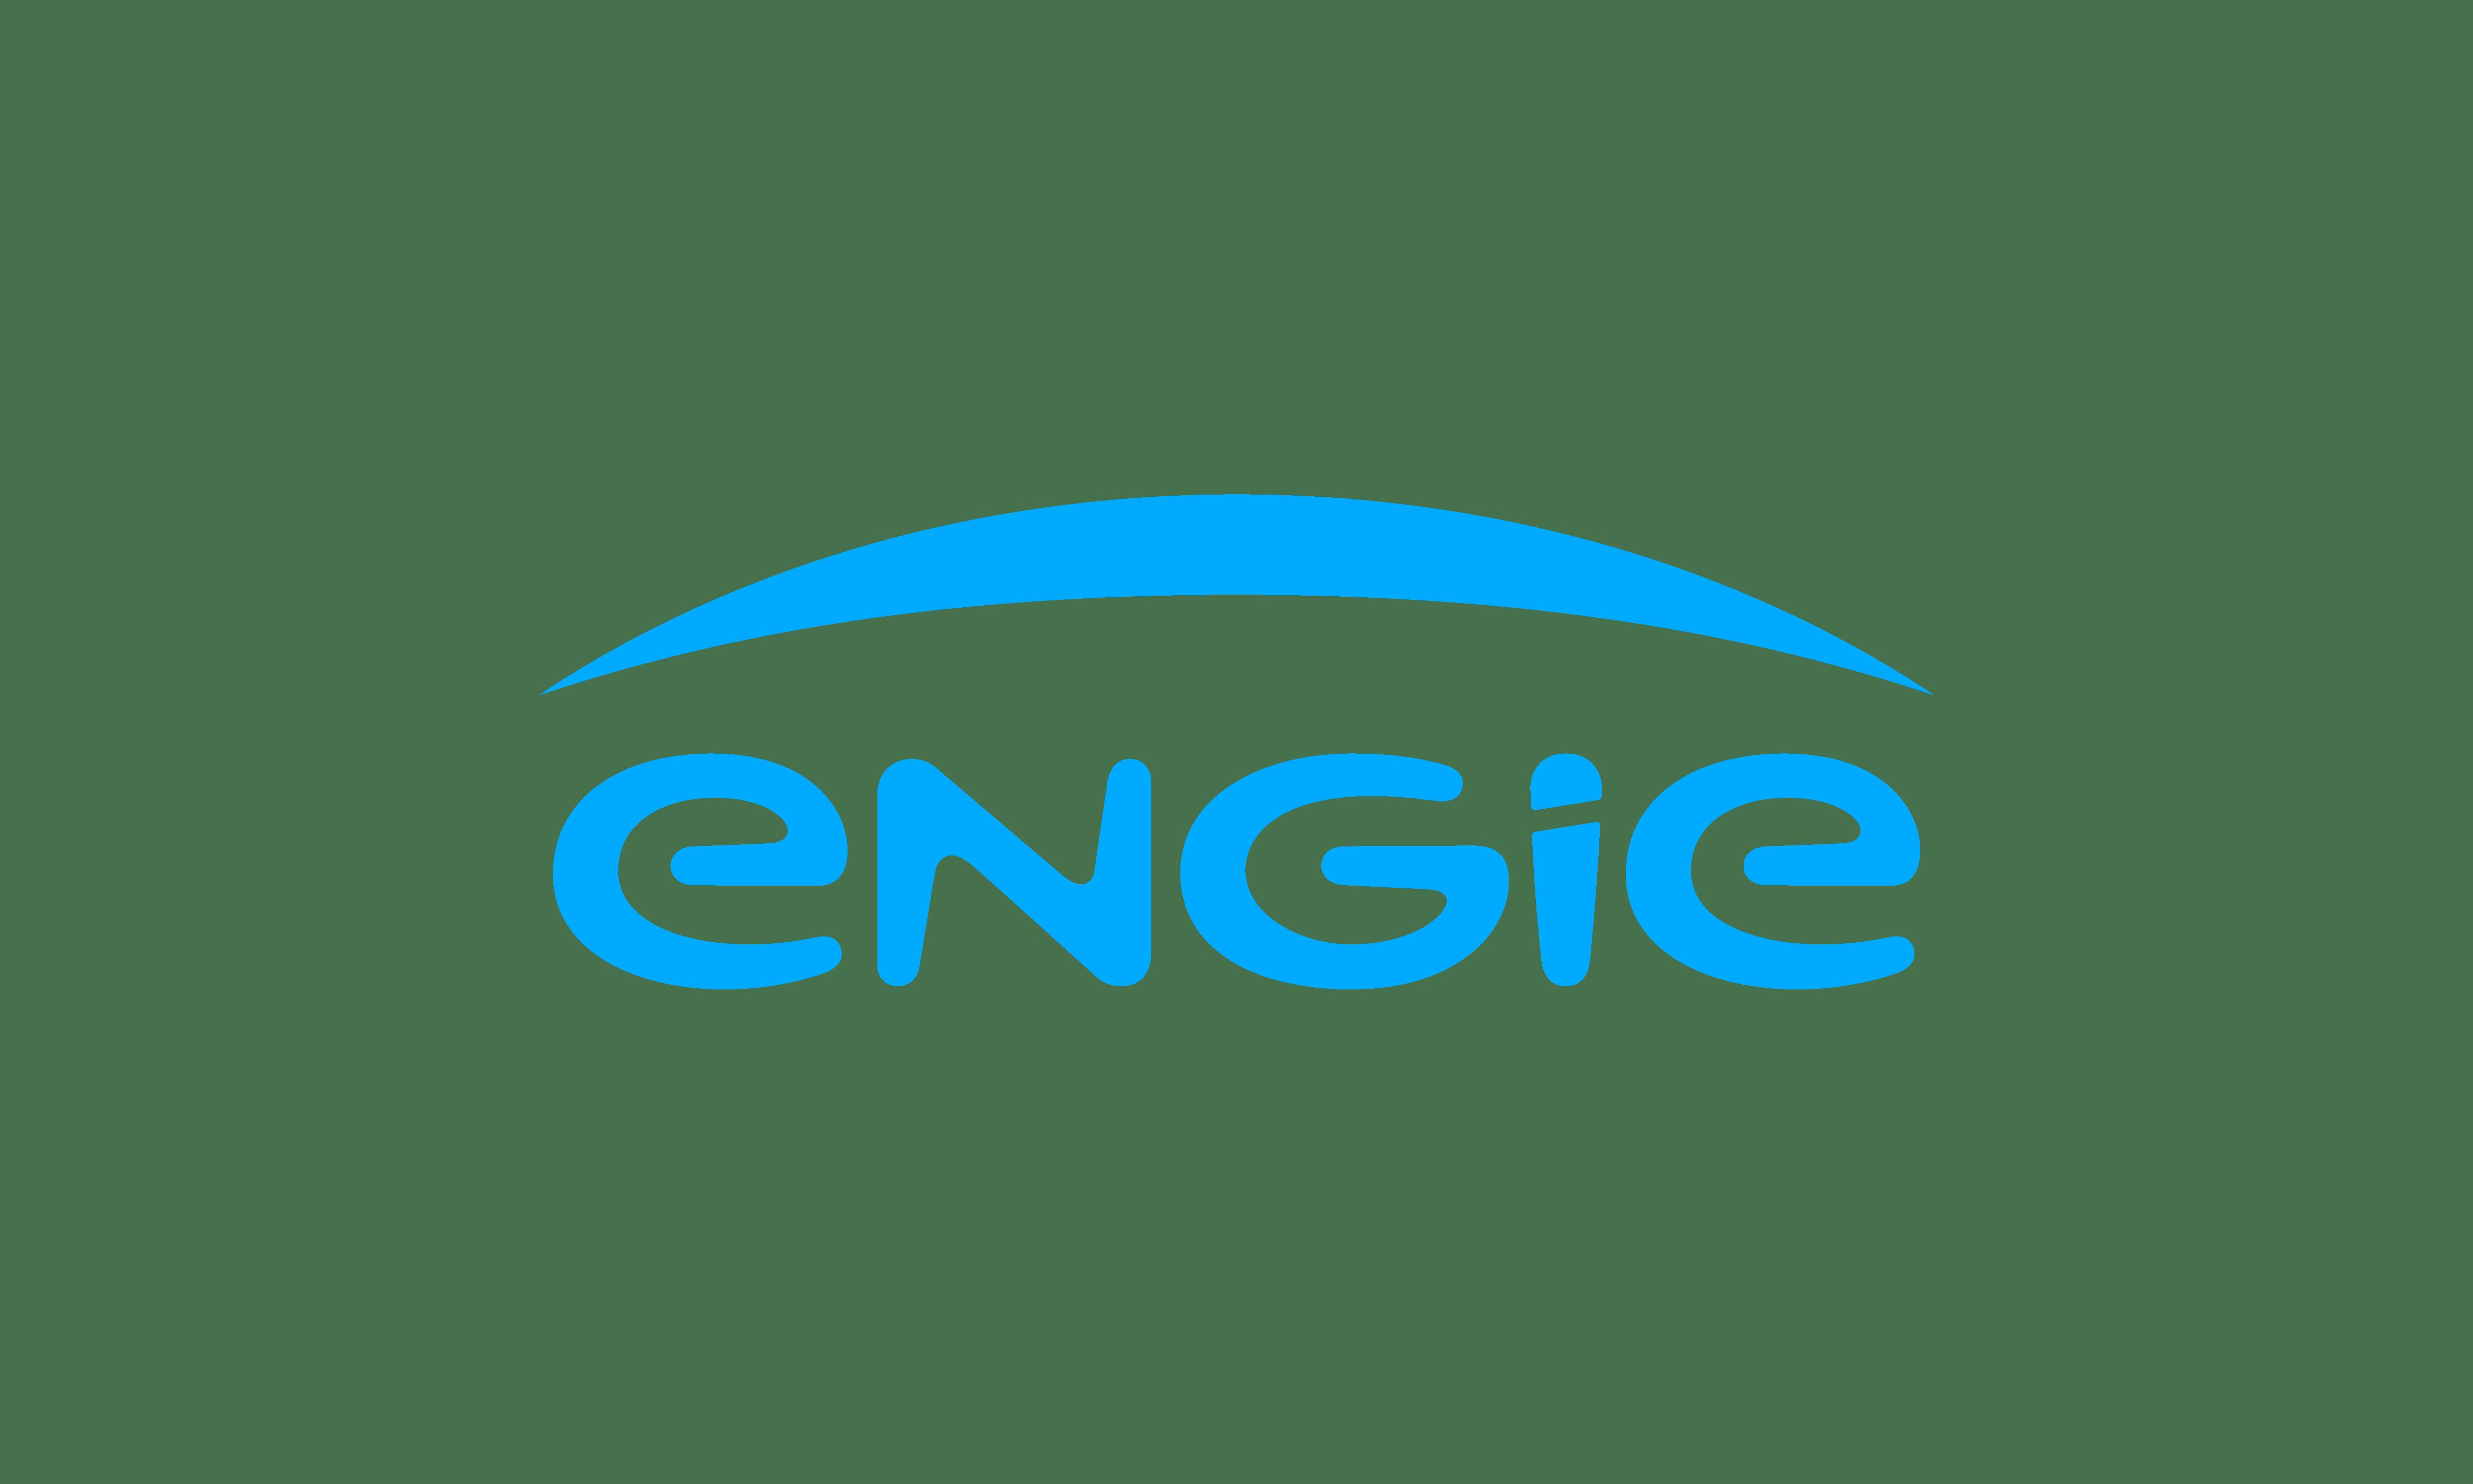 Engie